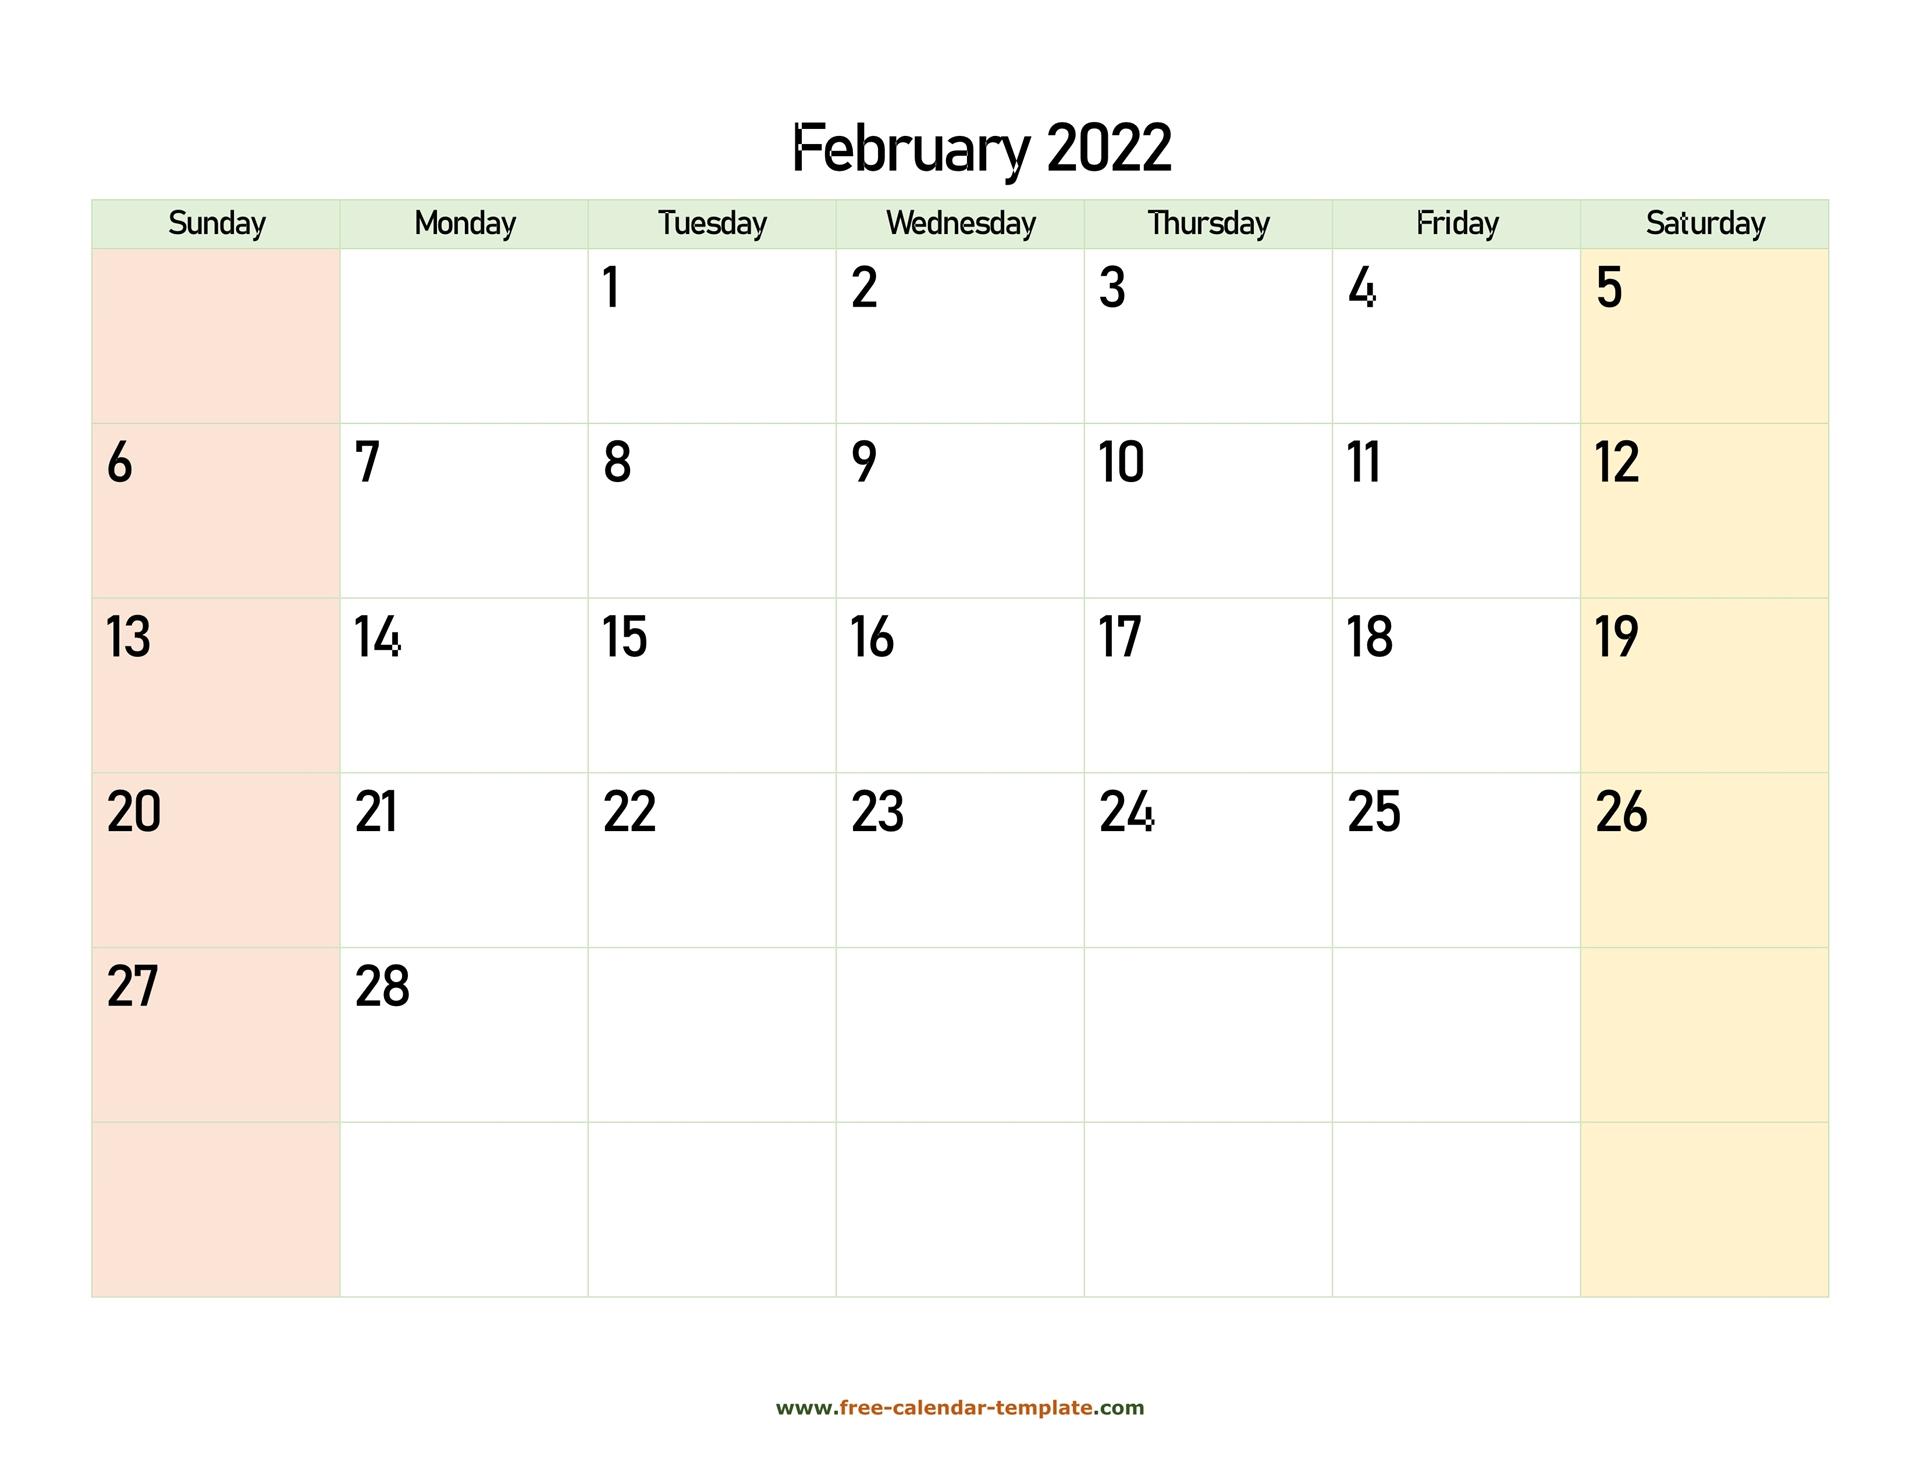 February 2022 Free Calendar Tempplate | Free Calendar Inside Free Printable Calendar February 2022